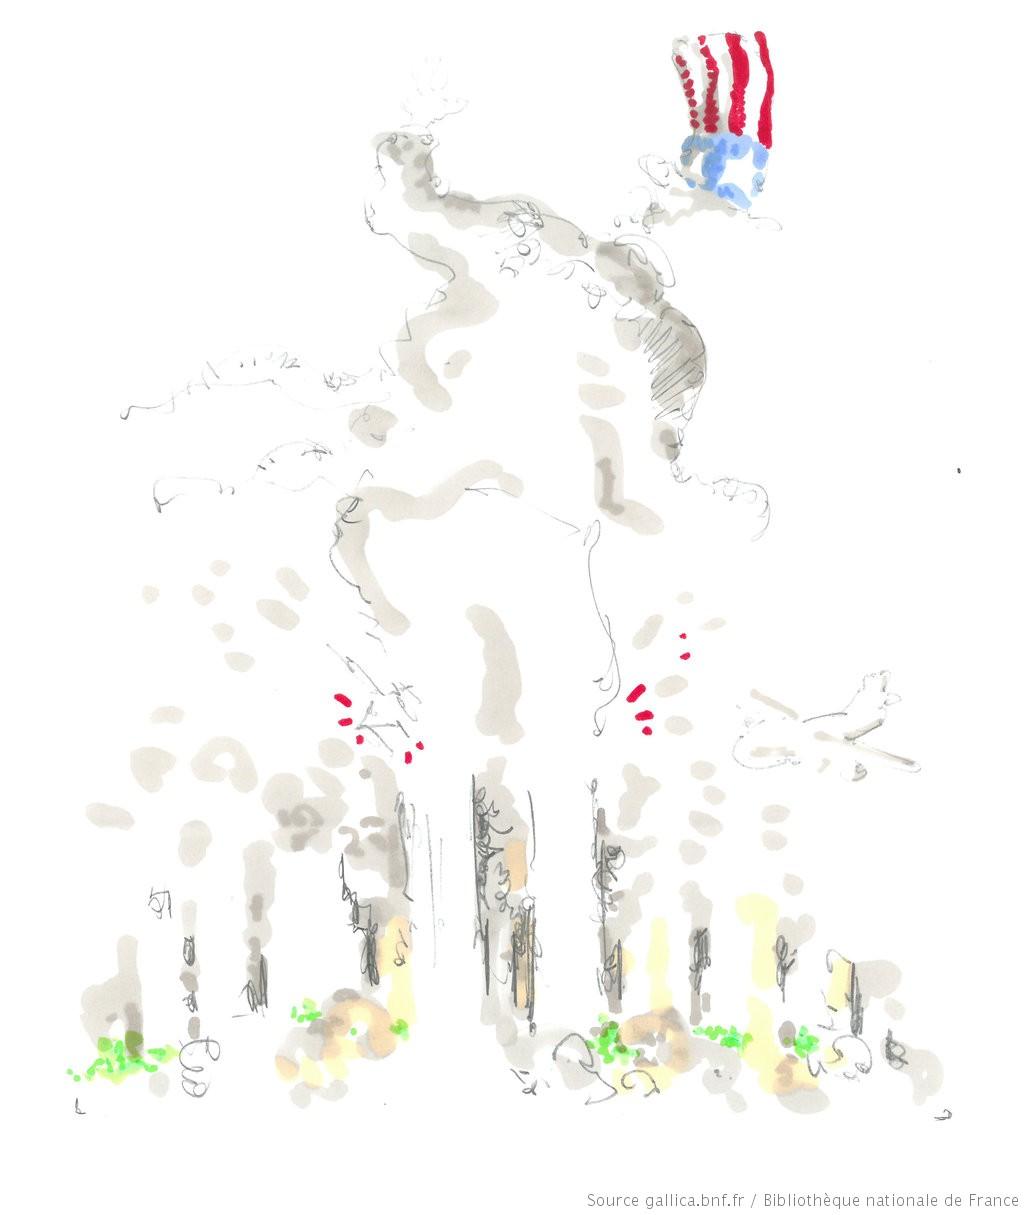 pieds_dargile_-_oncle_sam_.plantu_1951-_btv1b10640311j-3.jpeg